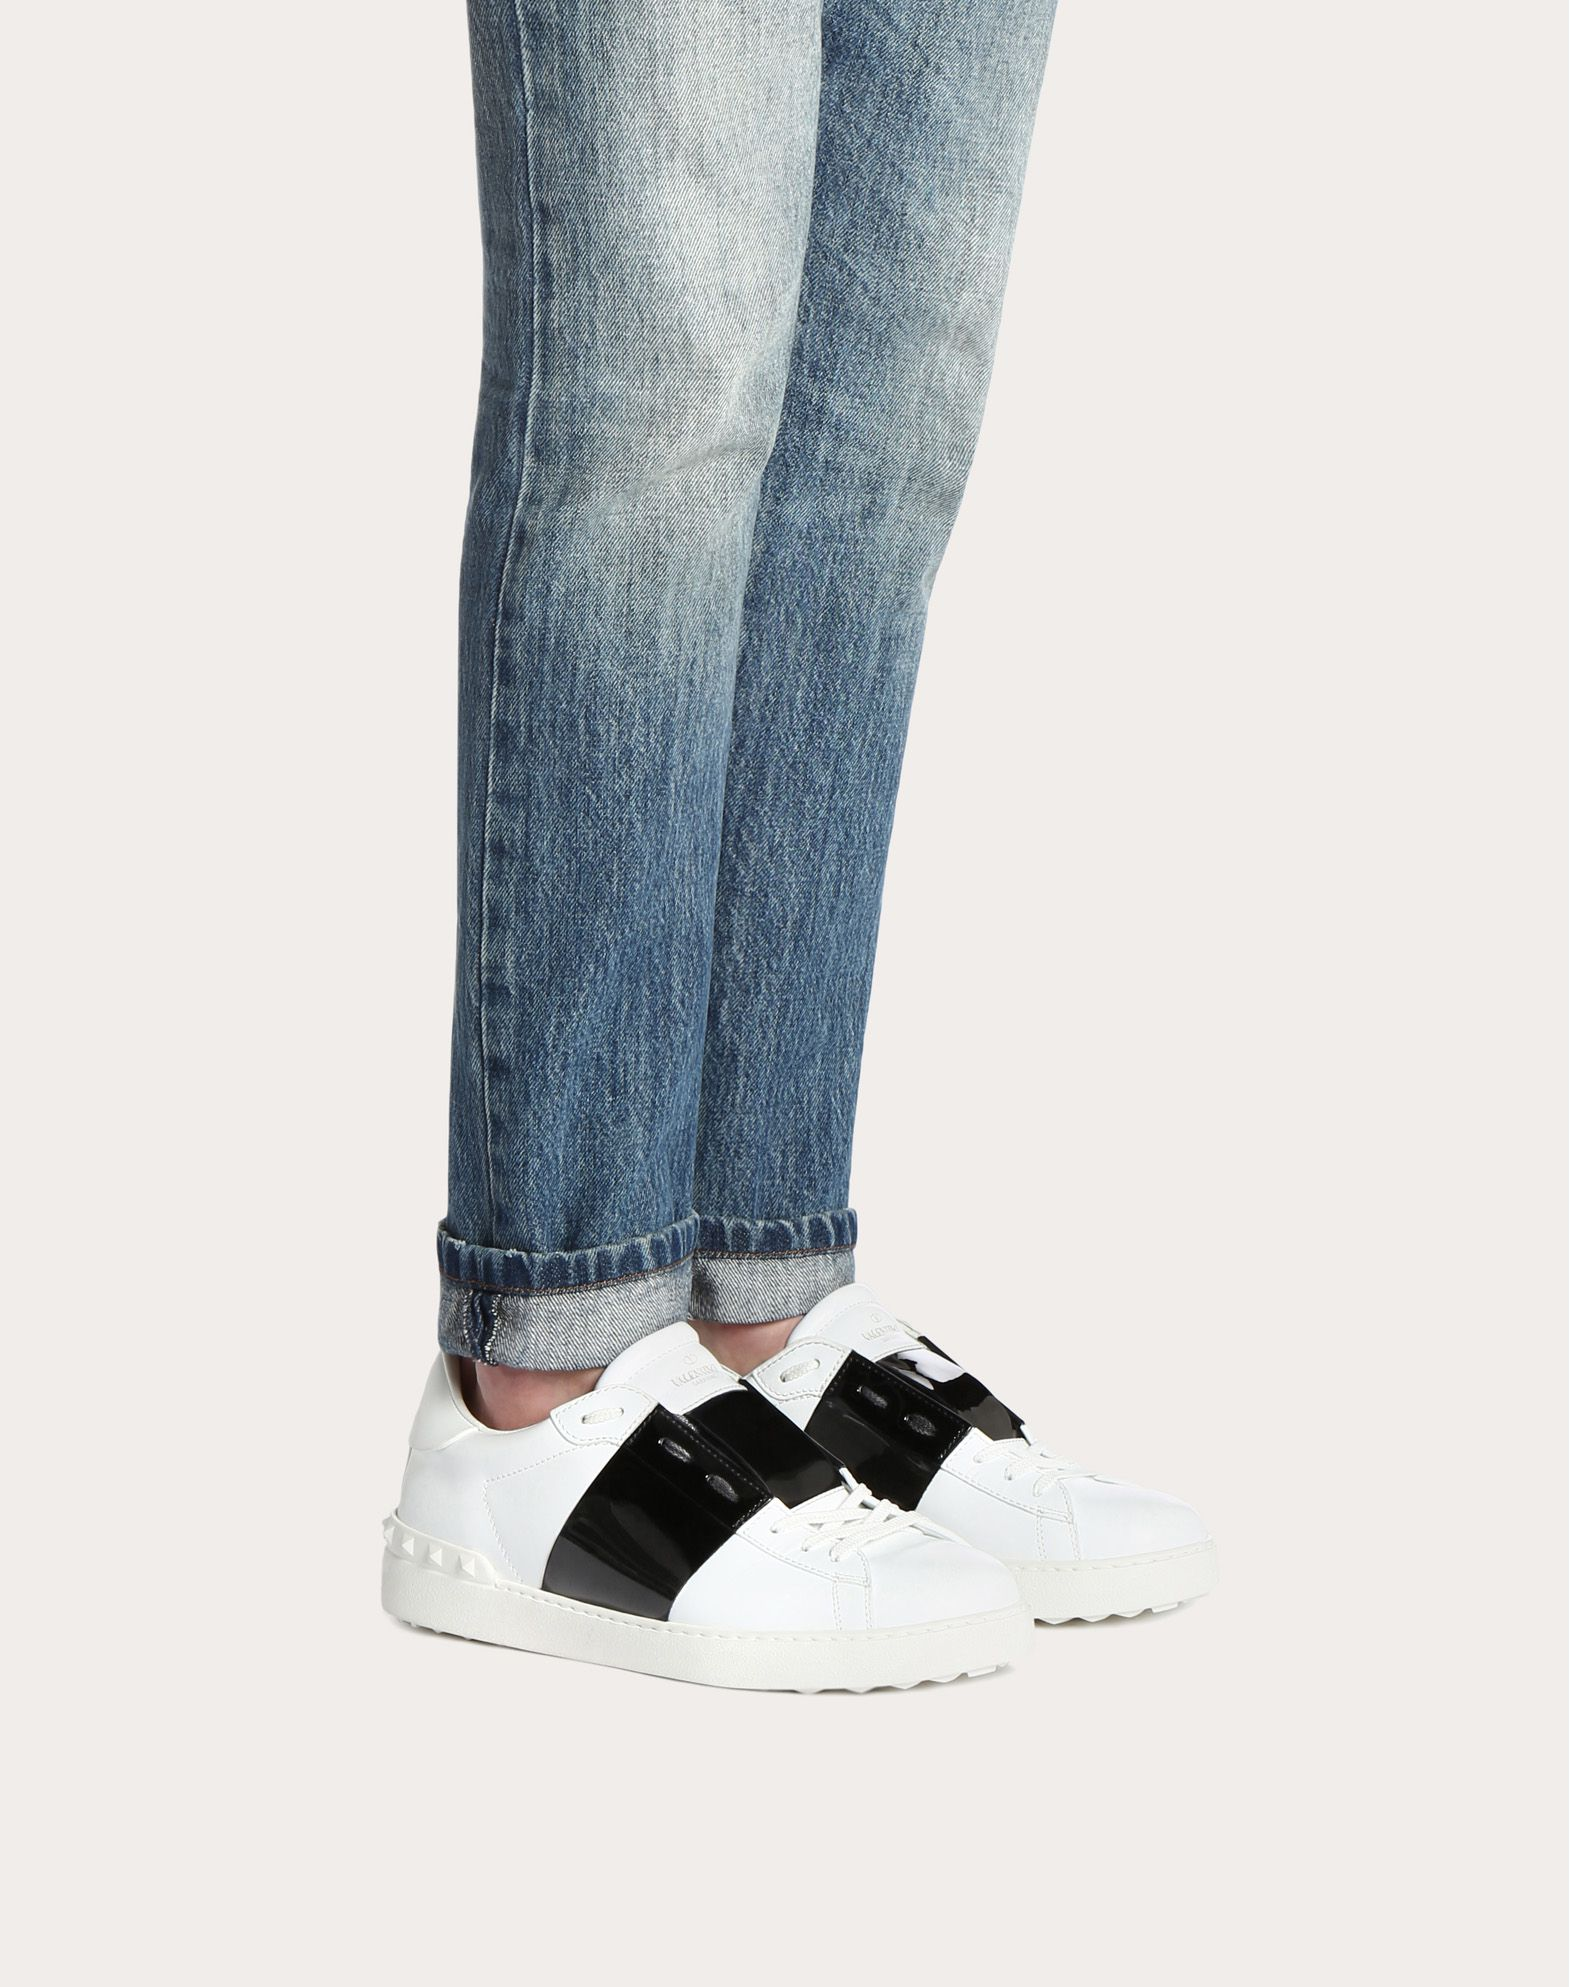 VALENTINO GARAVANI UOMO Open Sneaker LOW-TOP SNEAKERS U a